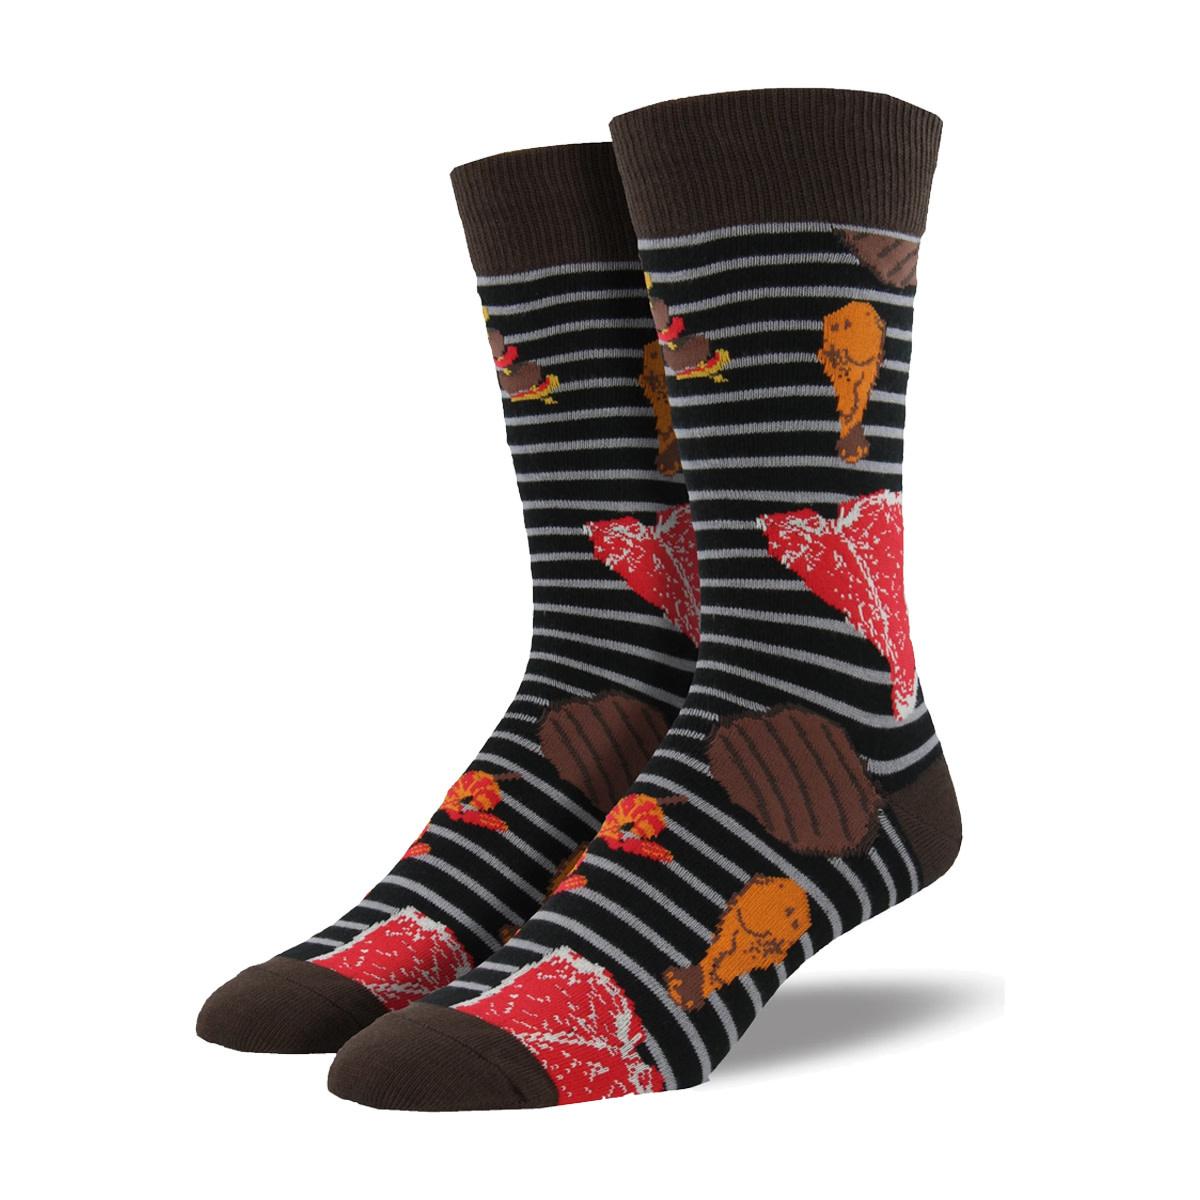 Socksmith Socksmith Men's Cotton Crew Socks Grillin N Chillin Black M 7 - 12.5